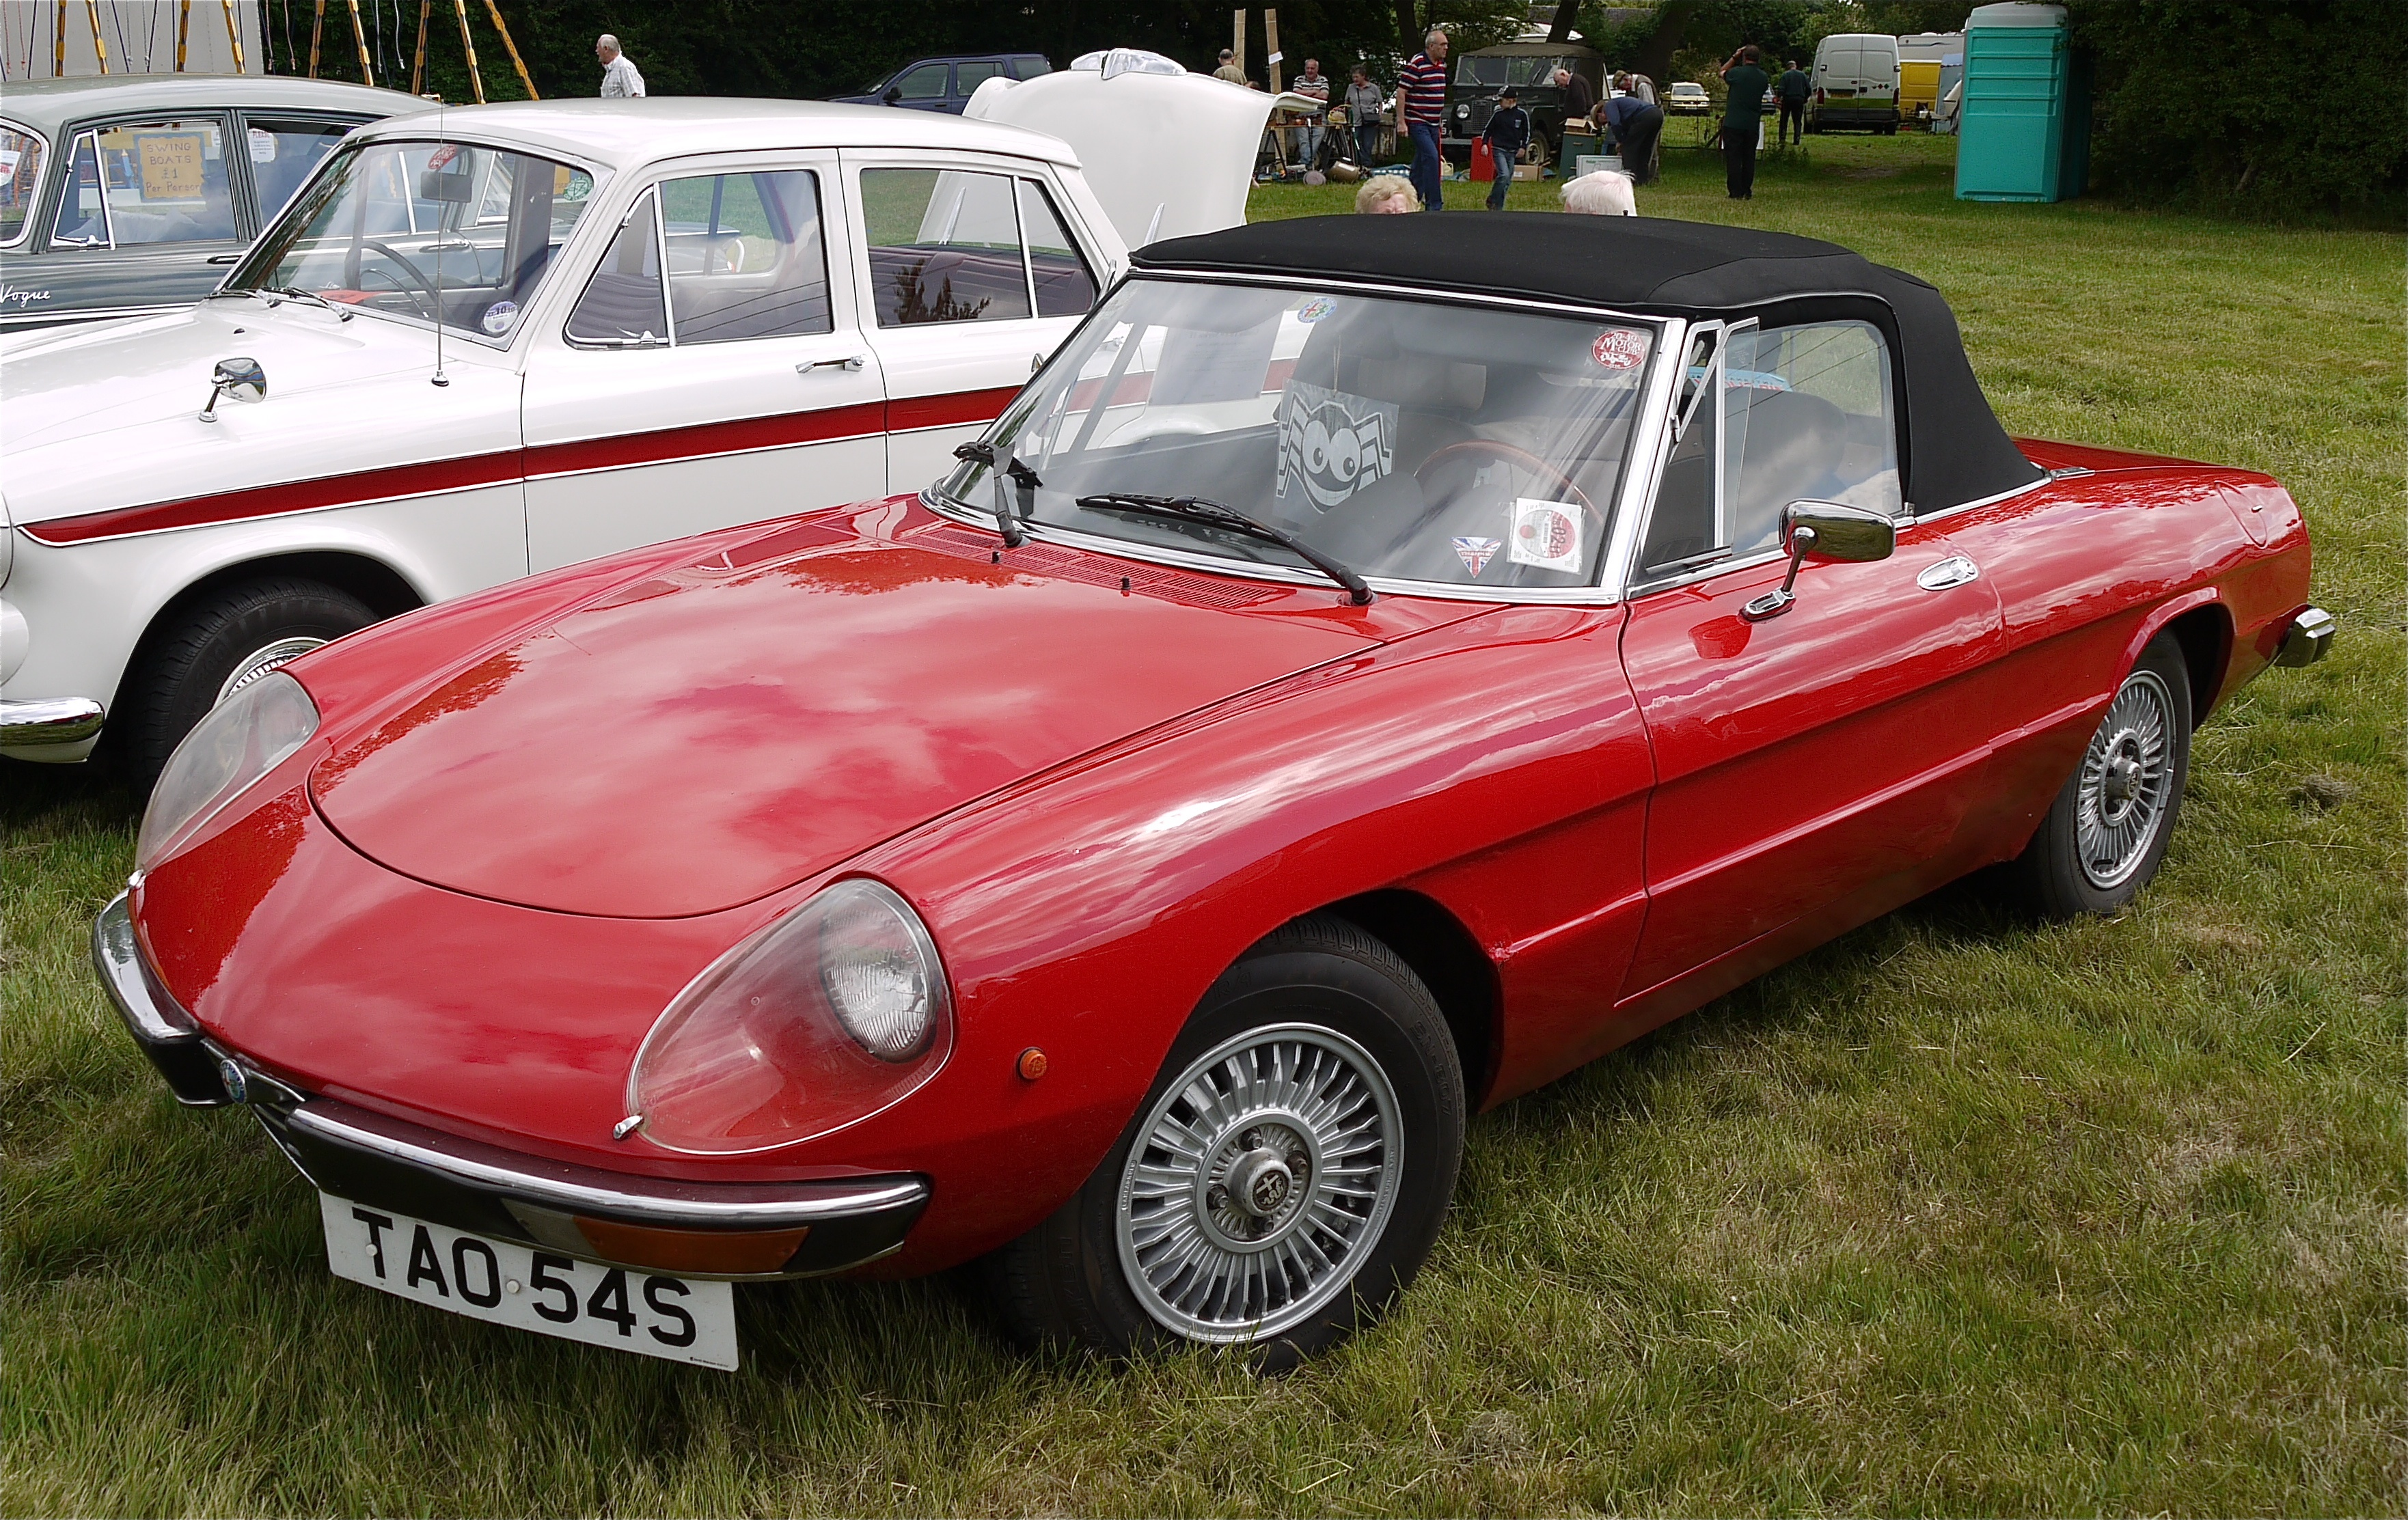 File:1978 Alfa Romeo Spider - mick (Lumix).jpg - Wikimedia ...